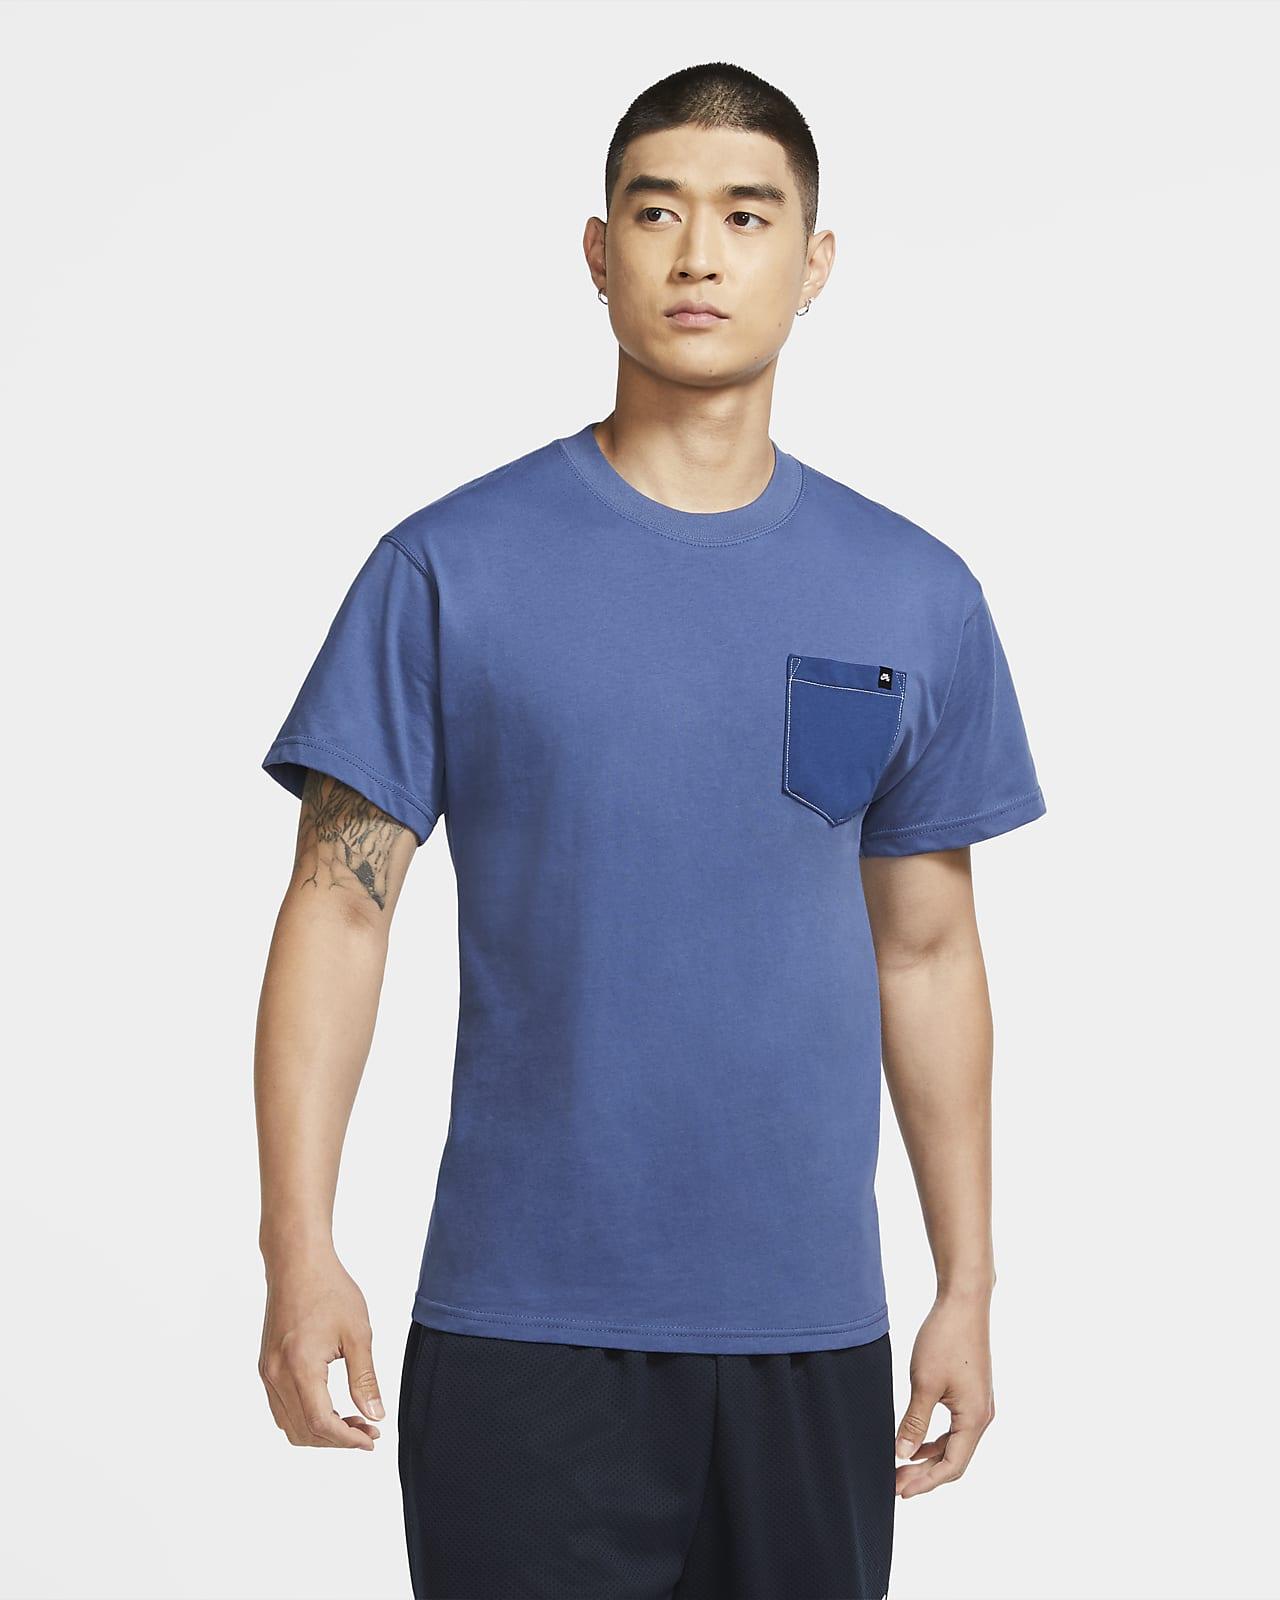 Nike SB Men's Pocket Skate T-Shirt